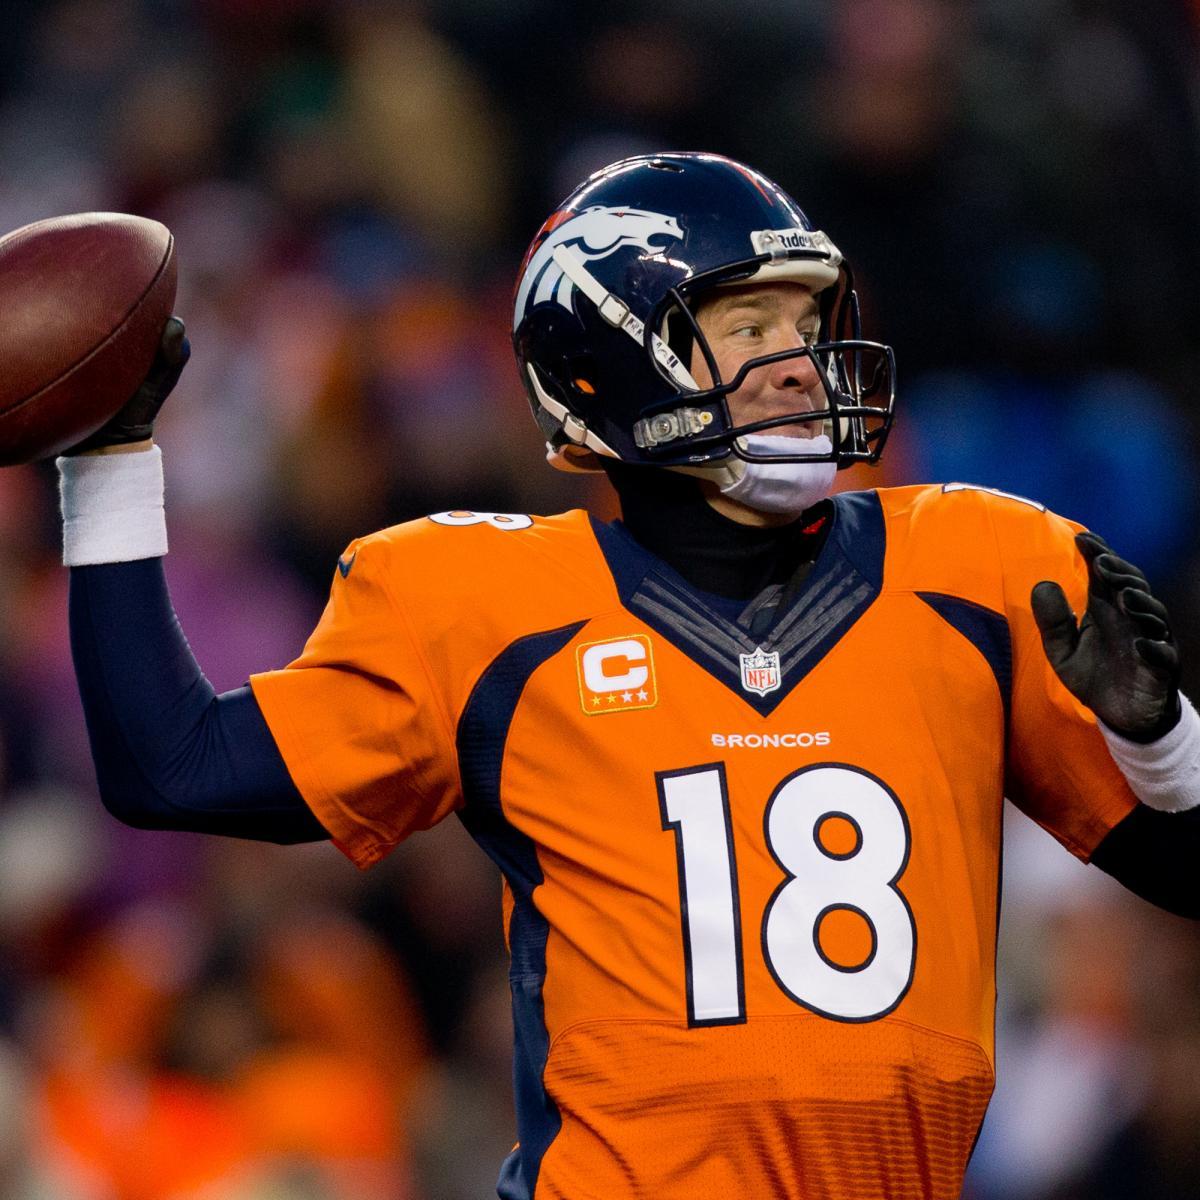 Peyton Manning visits Oakland Raiders, Denver Broncos send